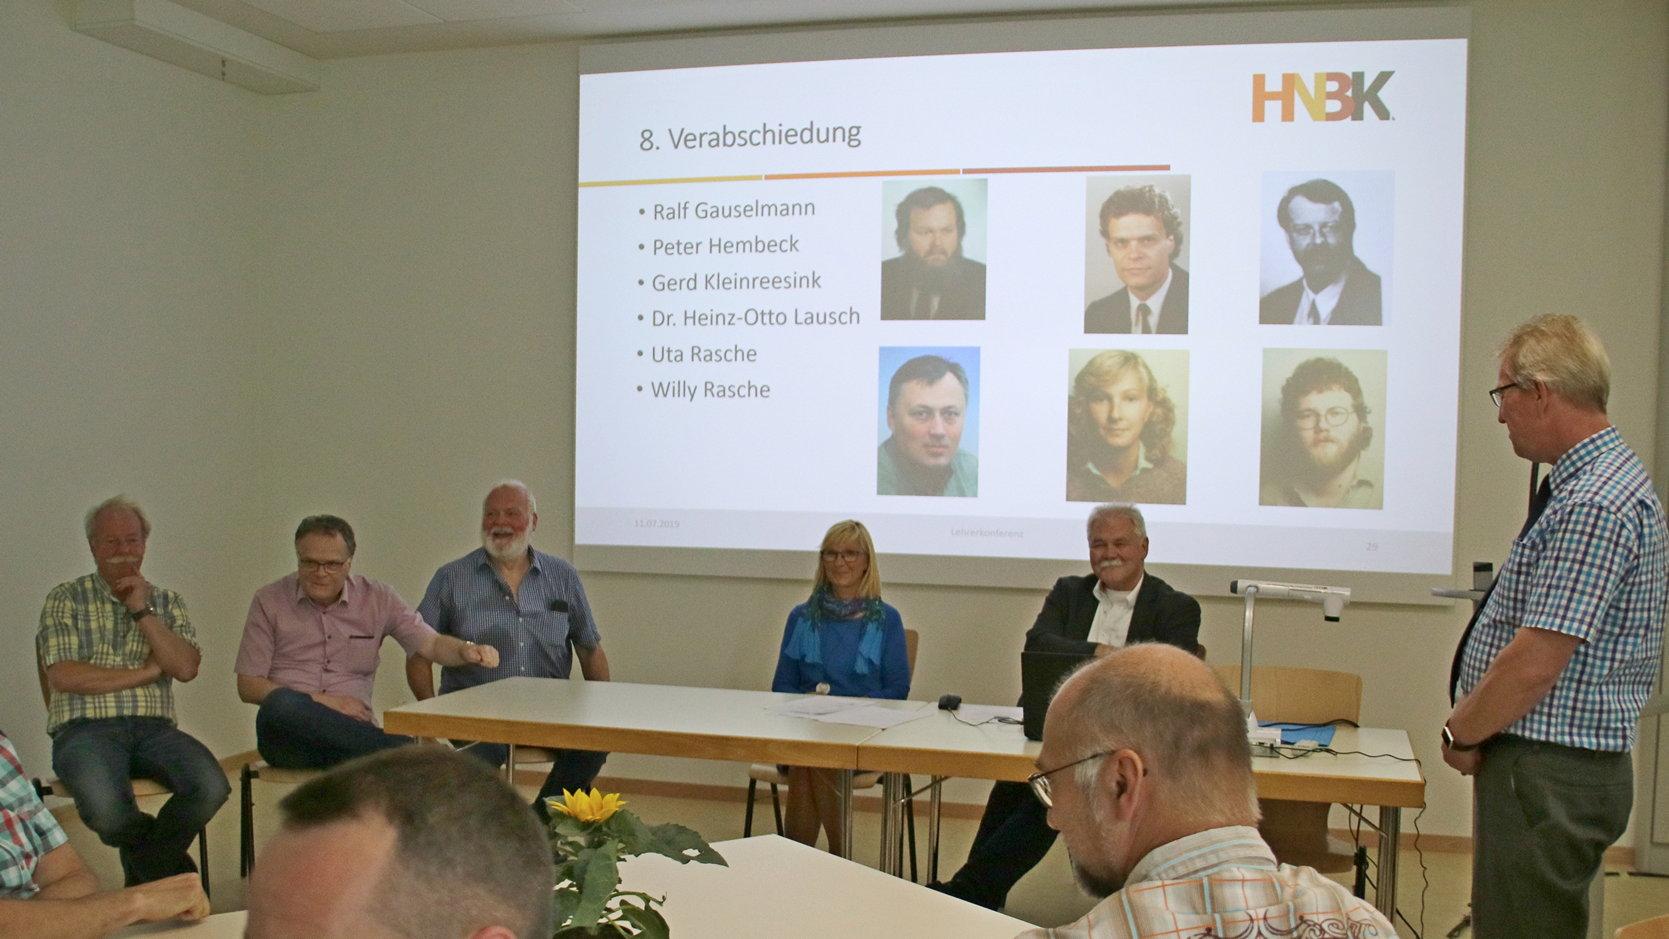 HNBK verabschiedet langjährige Kollegen